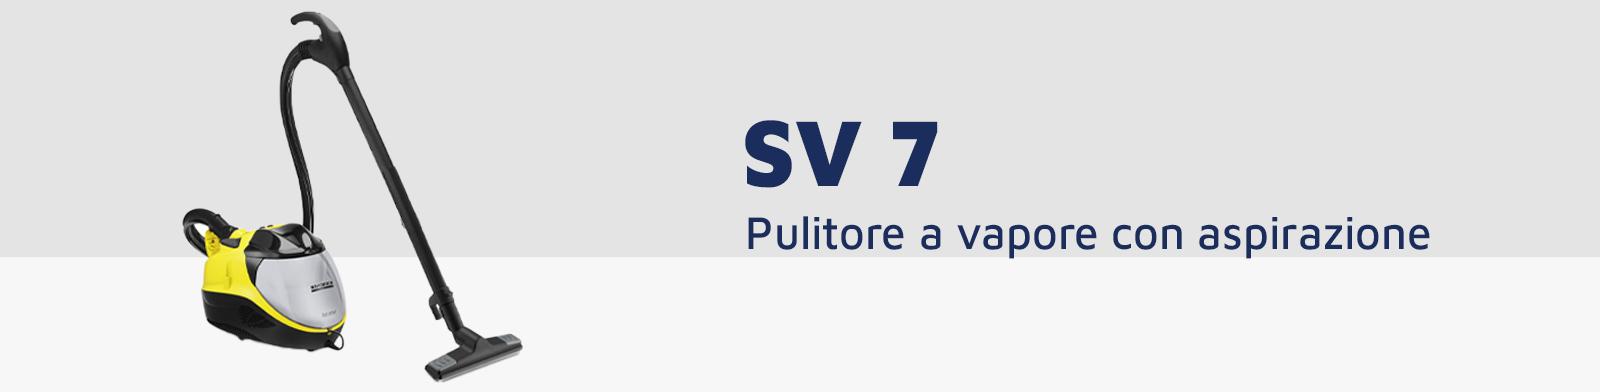 sv7 karcher